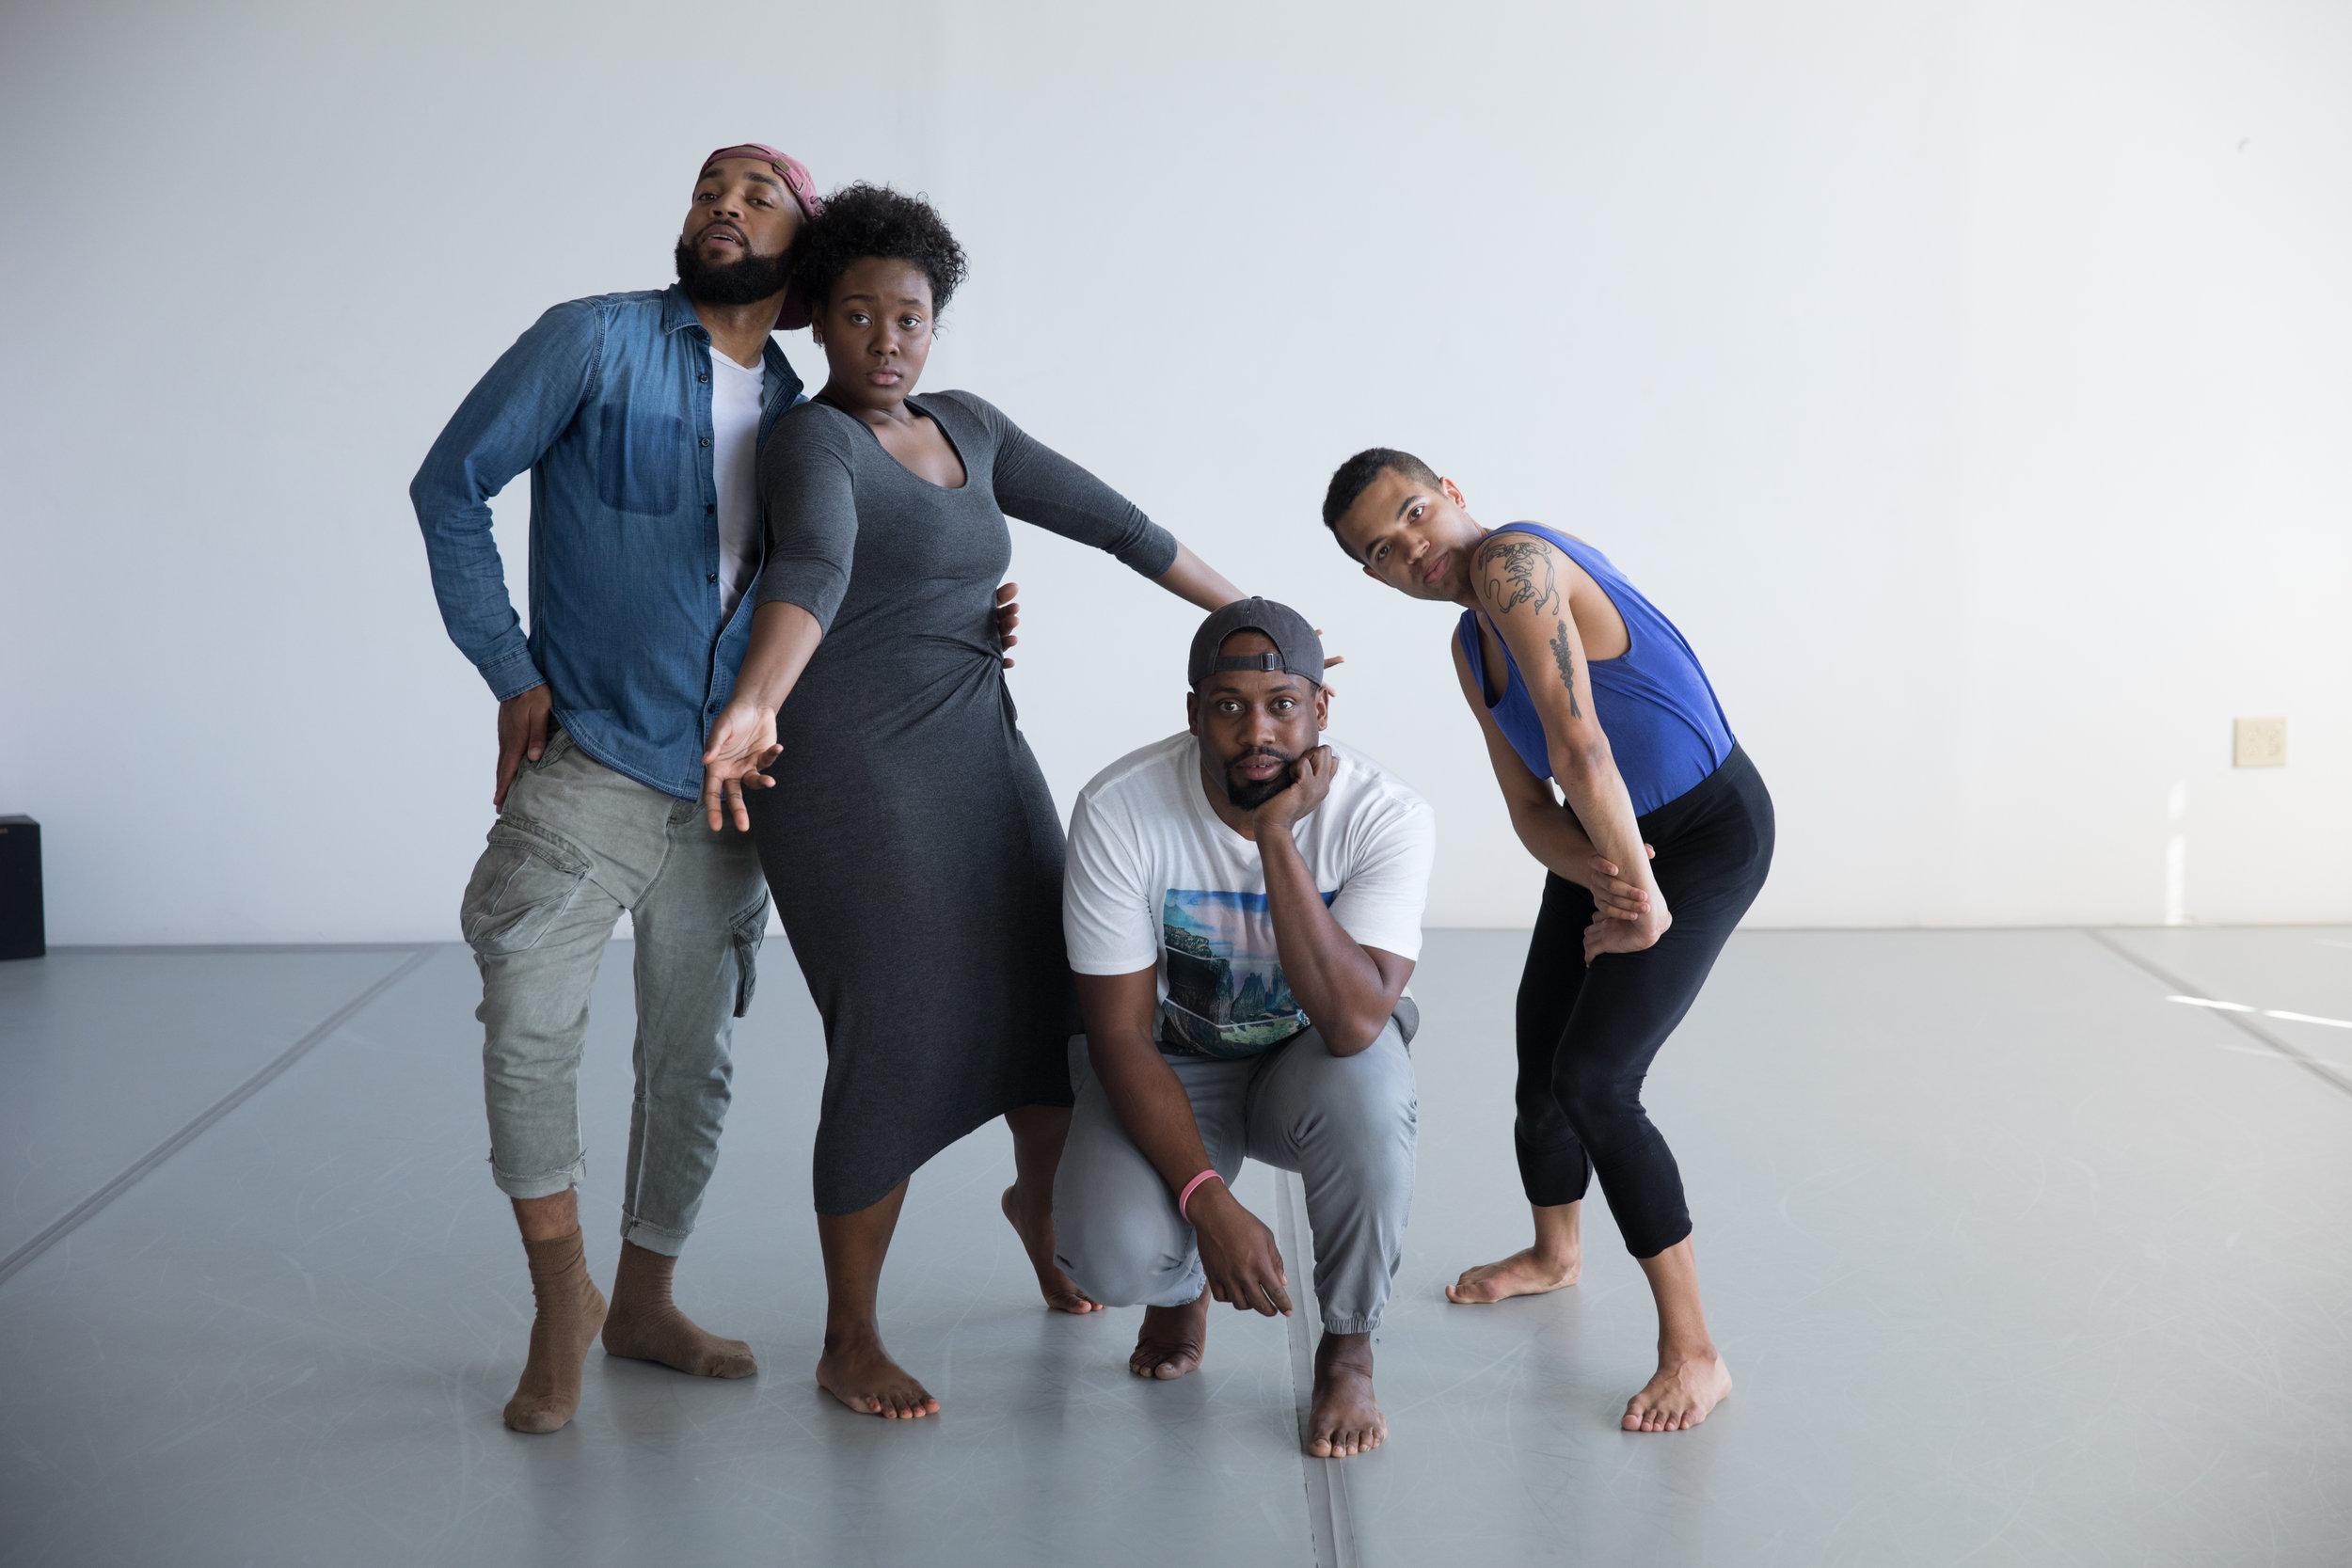 Zachary Orr, Lyrric Cosby-Jackson, Okwae A. Miller & Ben Stevenson, photo by Jamie Hopper